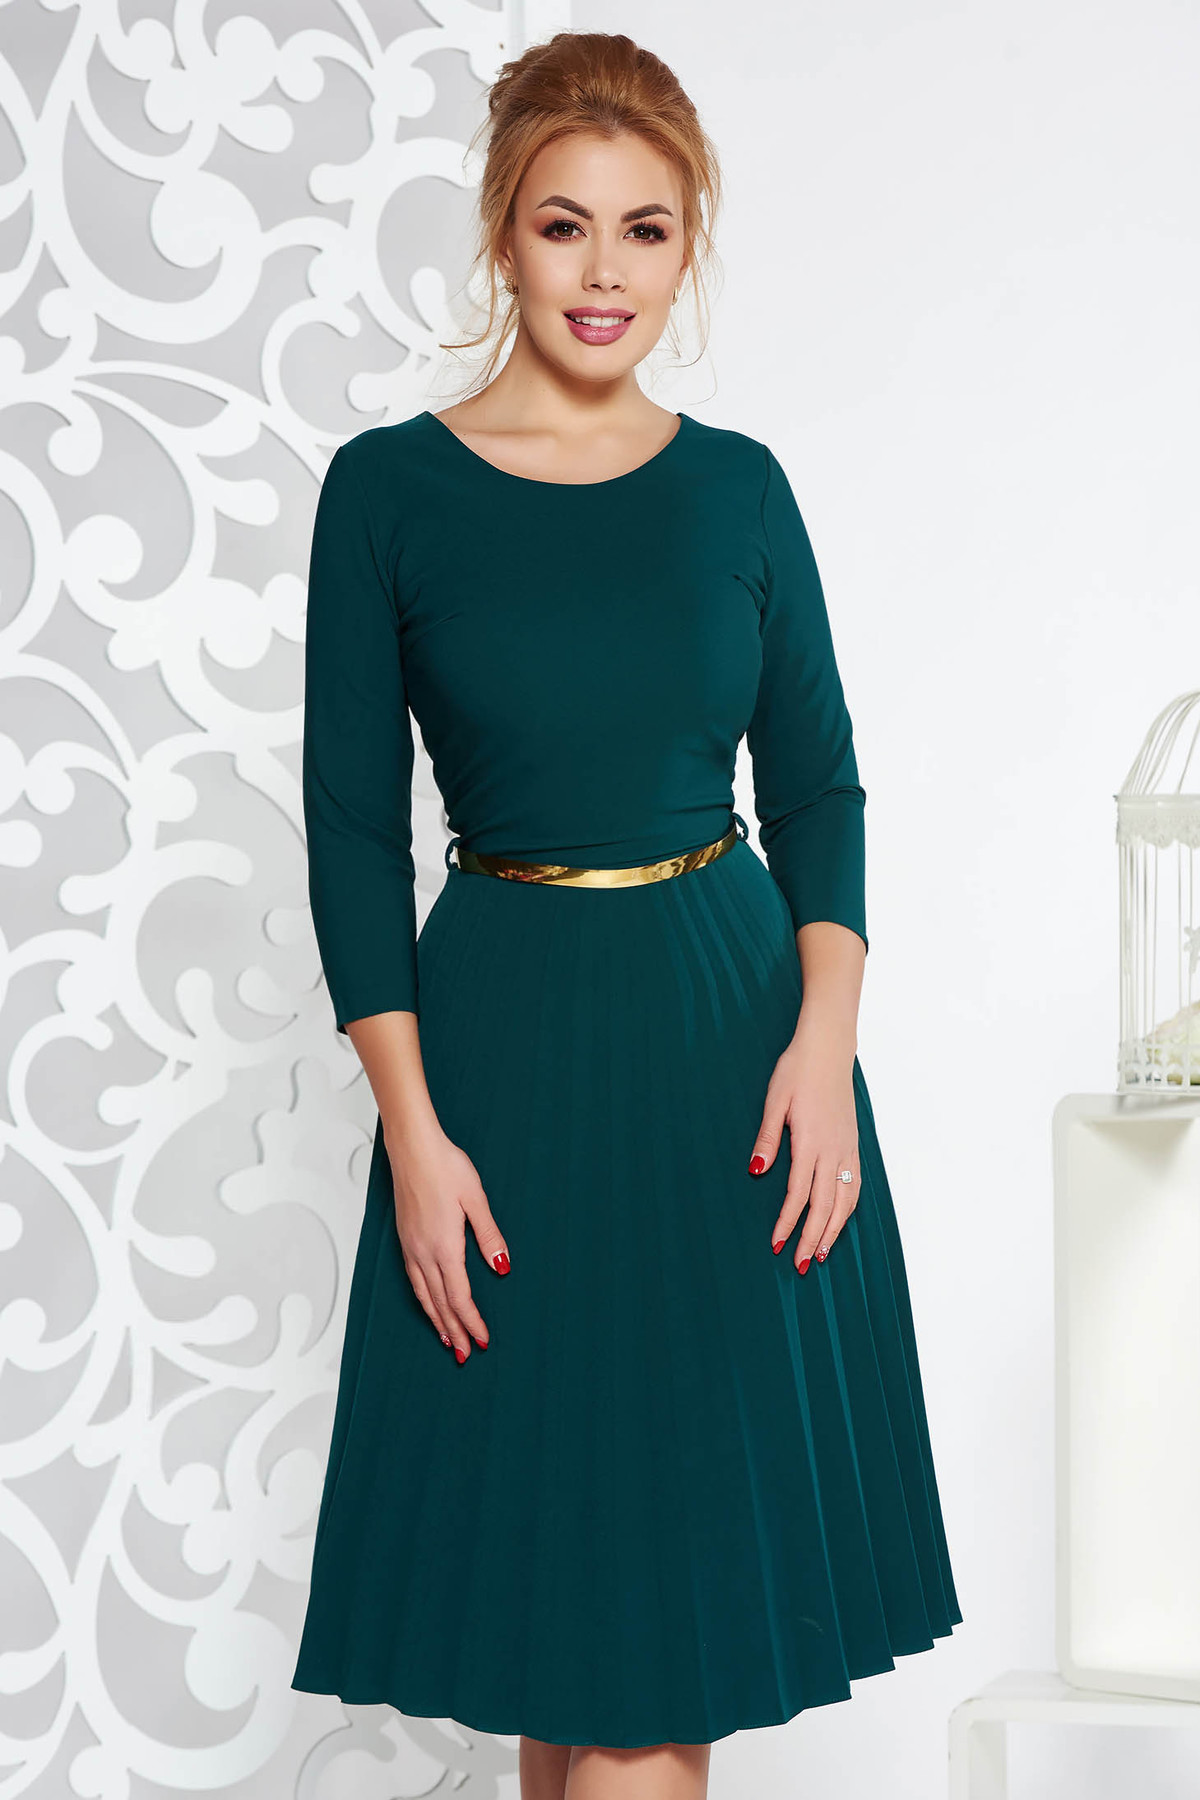 Rochie verde-inchis eleganta in clos plisata din stofa elastica subtire cu accesoriu tip curea